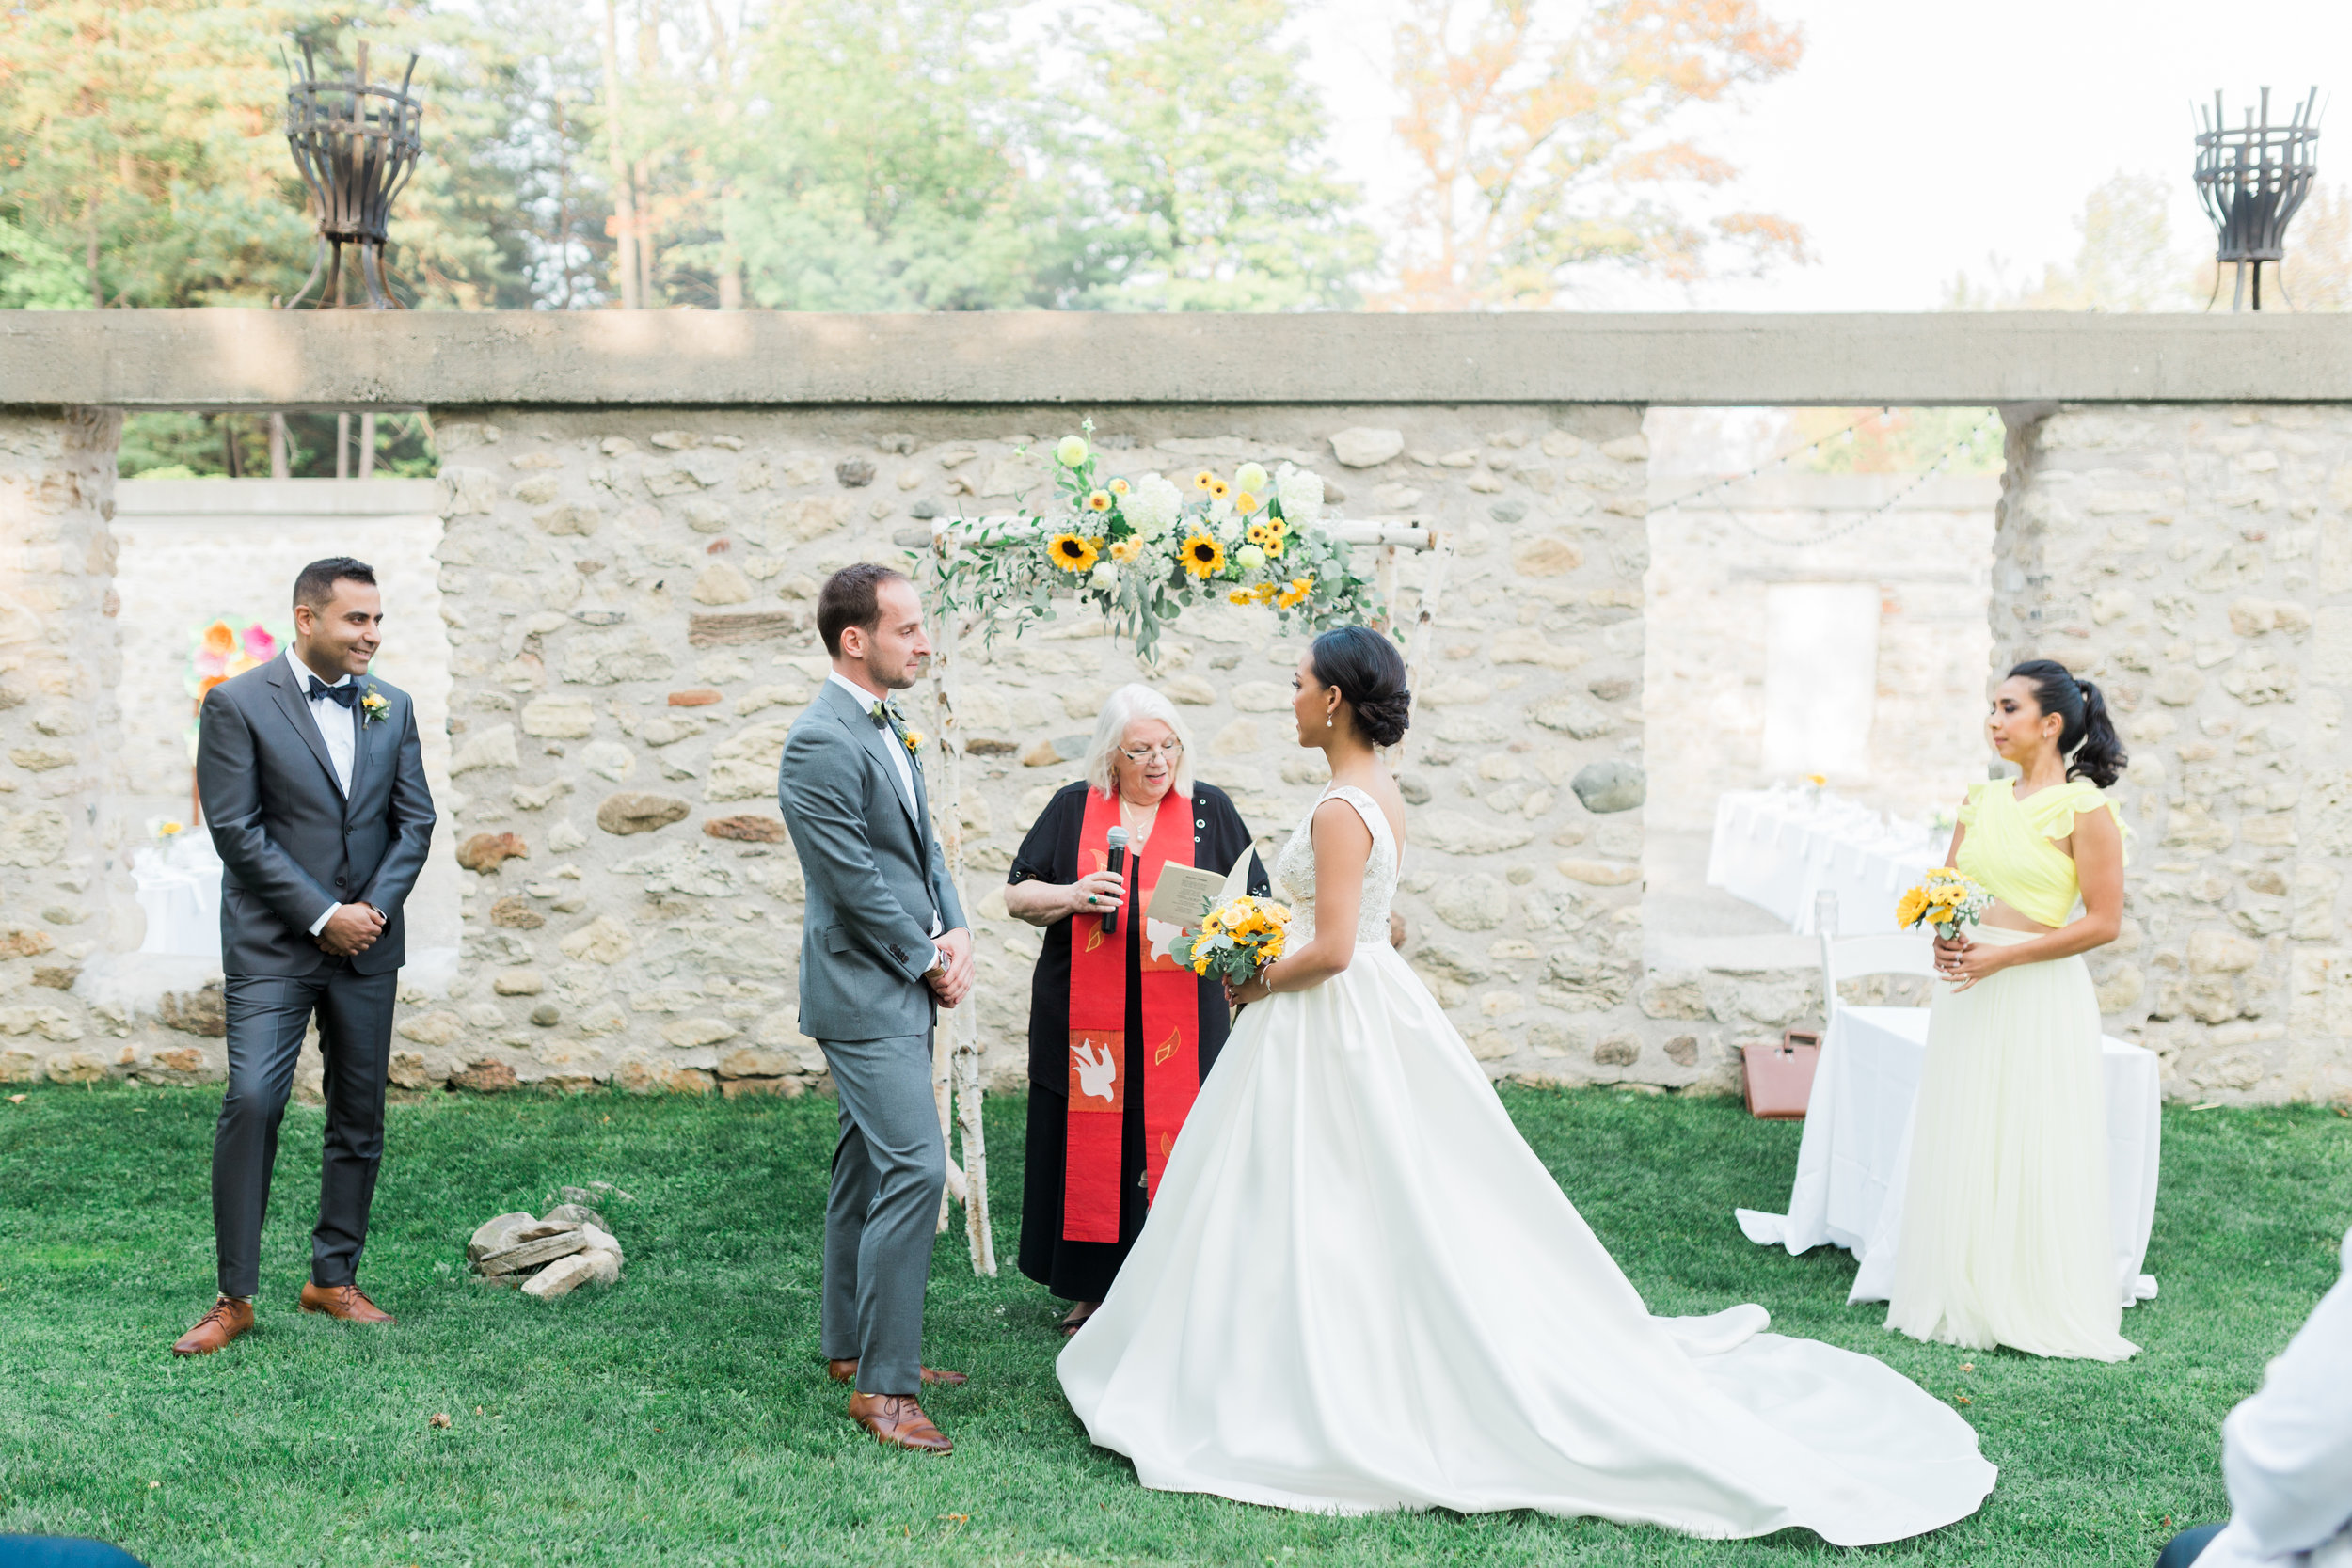 Alton Mills Wedding - Ceremony-48.jpg